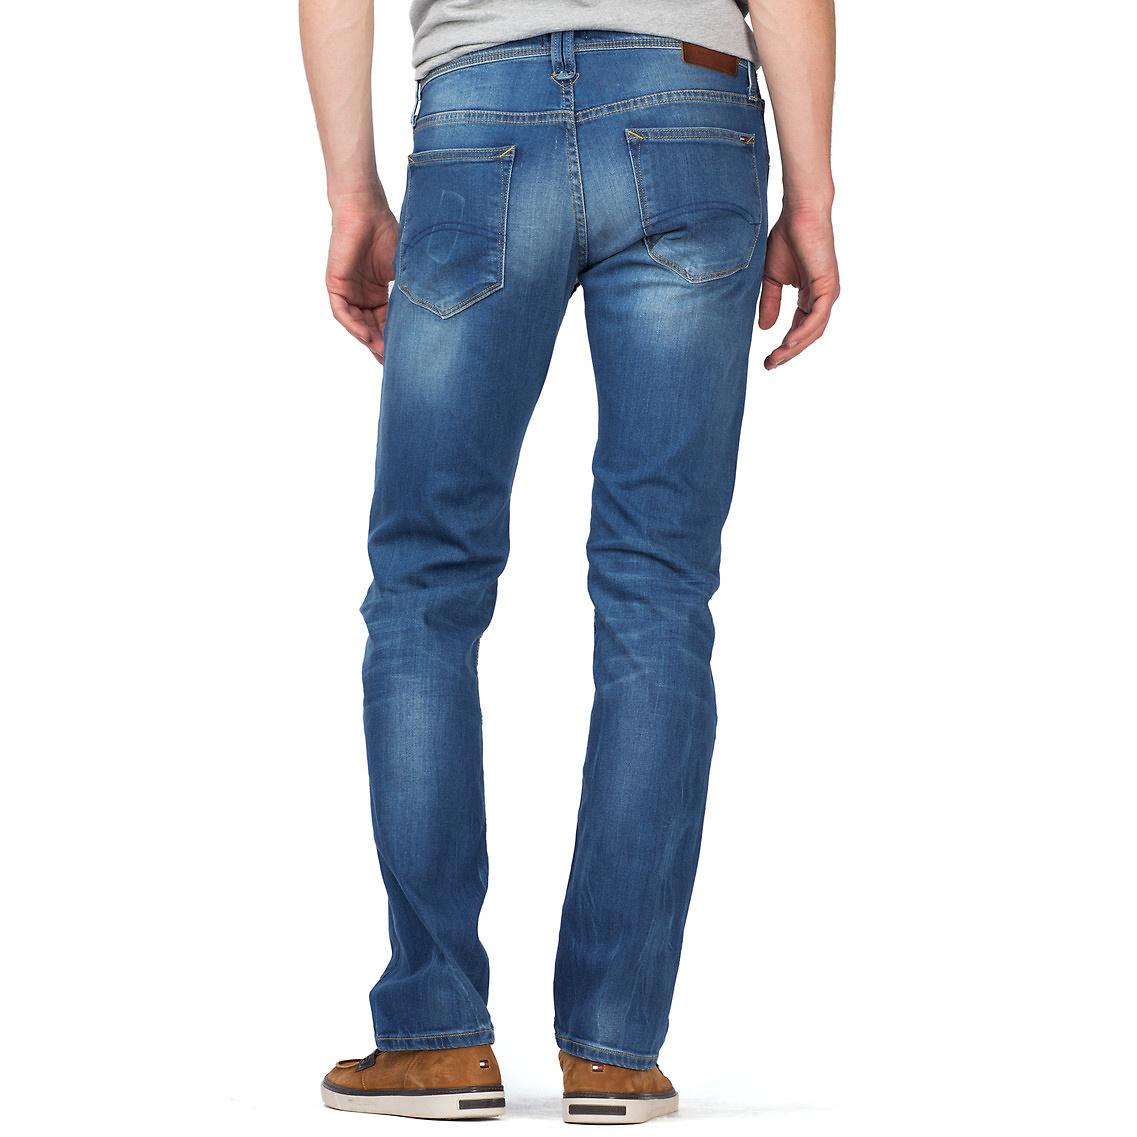 tommy hilfiger relaxed fit jeans in blue for men lyst. Black Bedroom Furniture Sets. Home Design Ideas